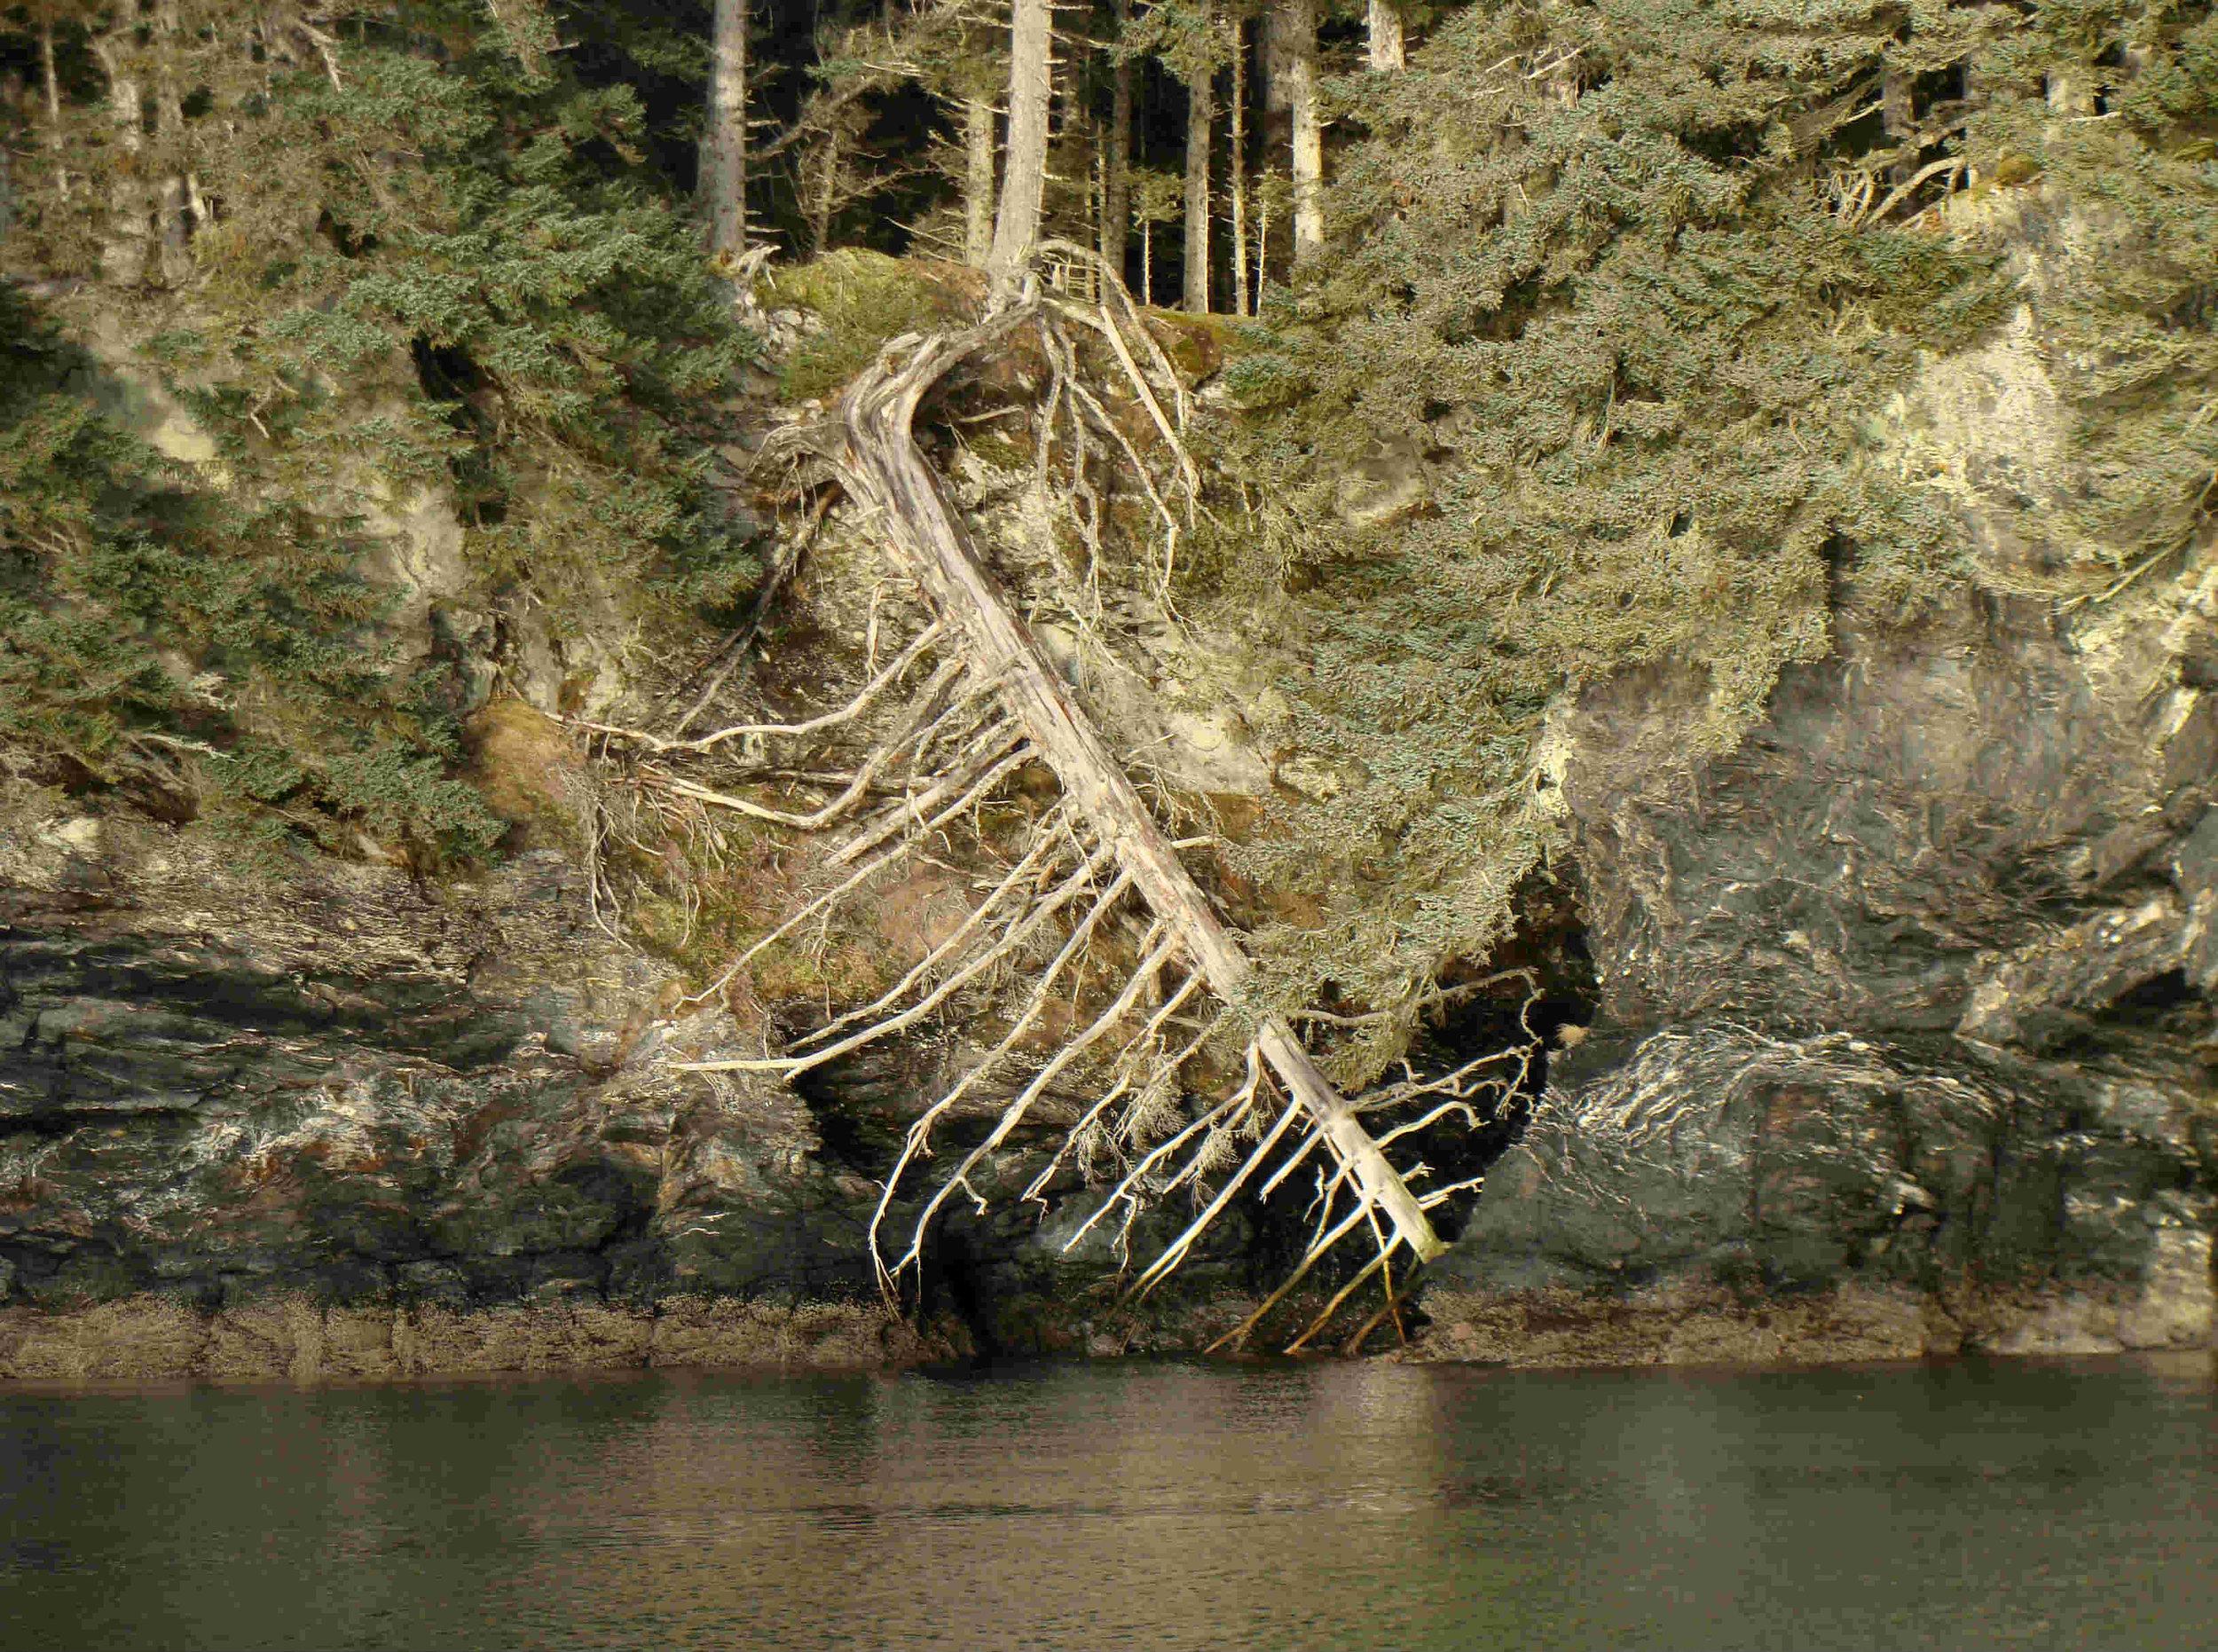 150-foot Sitka spruce